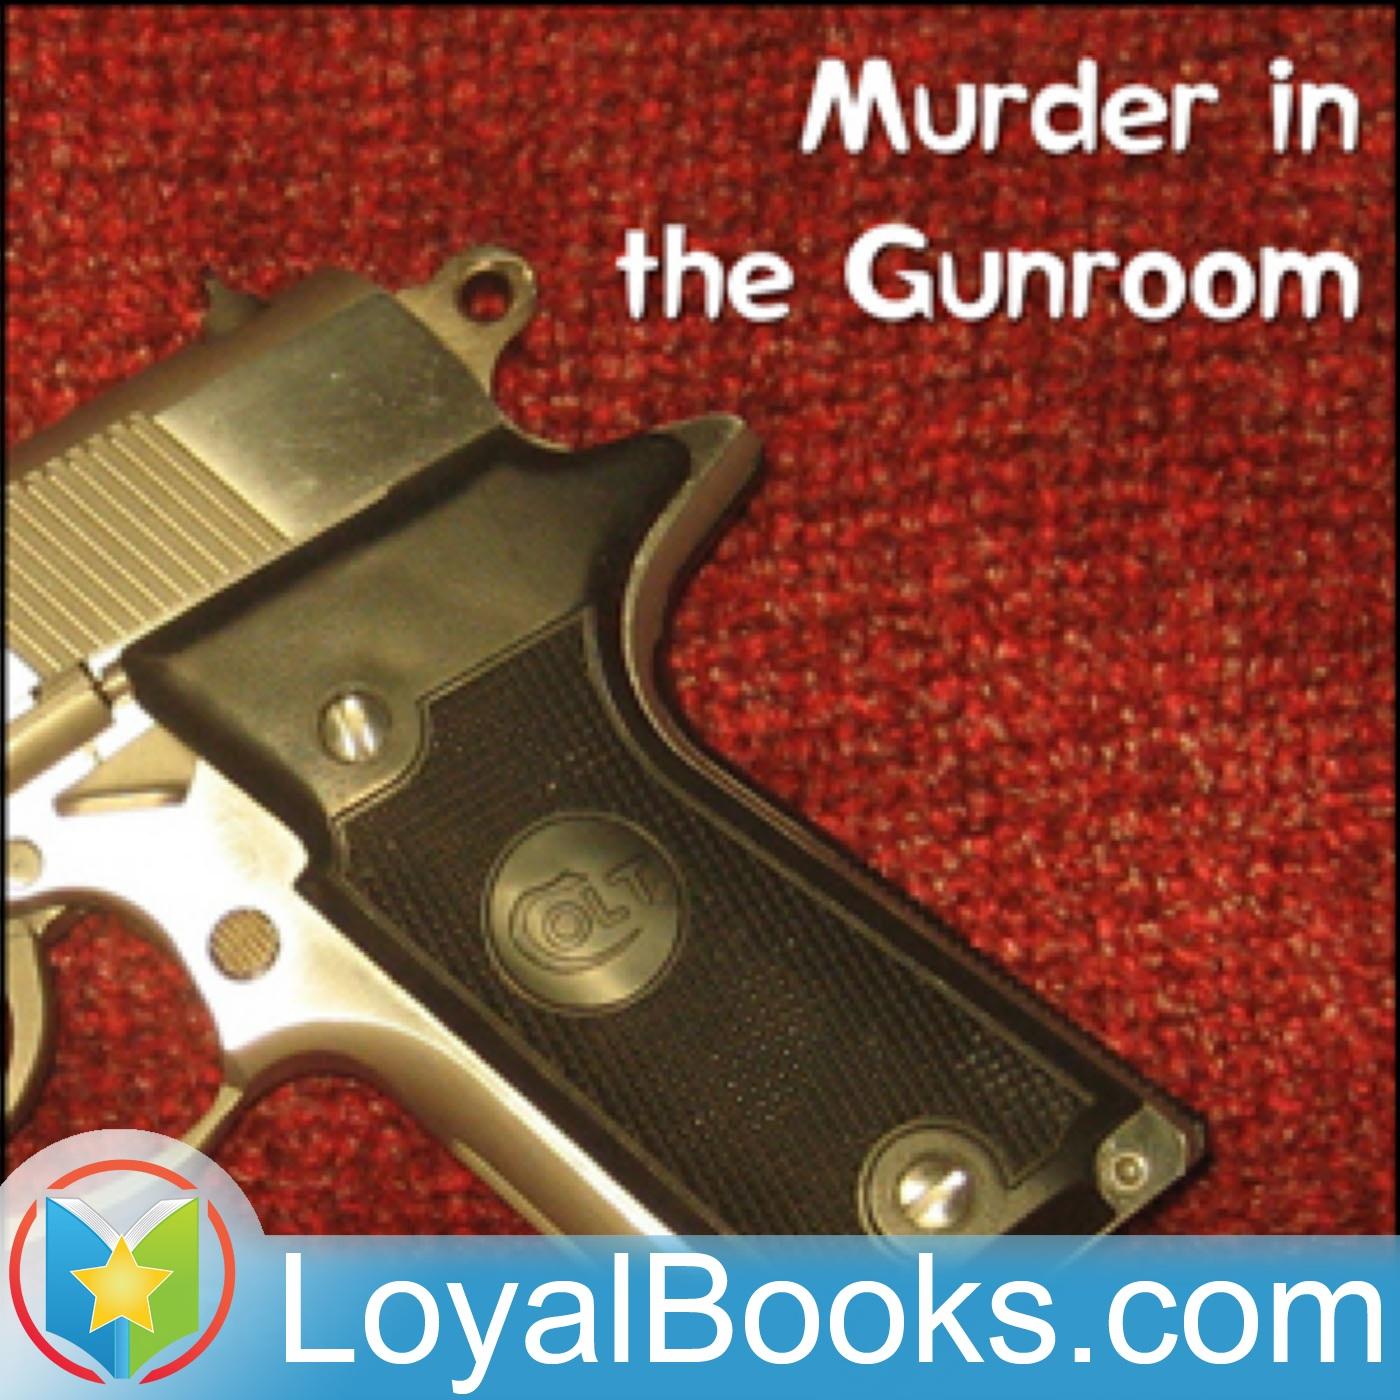 <![CDATA[Murder in the Gunroom by H. Beam Piper]]>